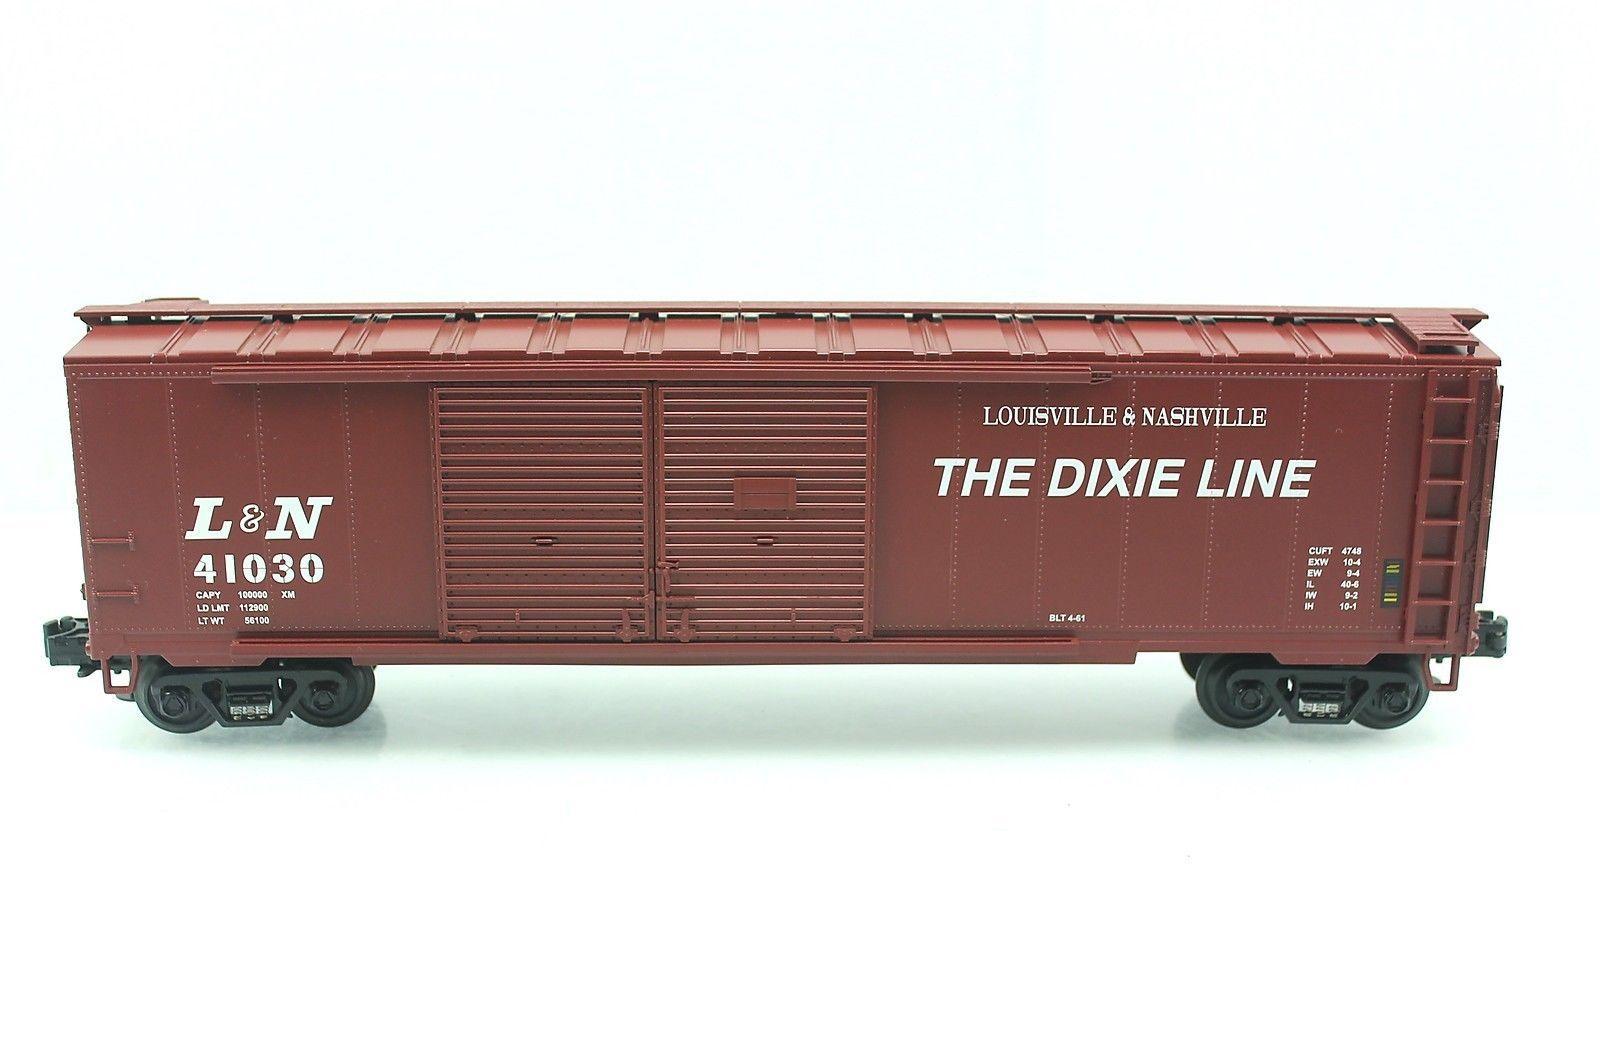 O Mth L N 41030 Dixie Line 50 Double Door Box Car 20 93013 Box Car Car Roof Box Double Doors